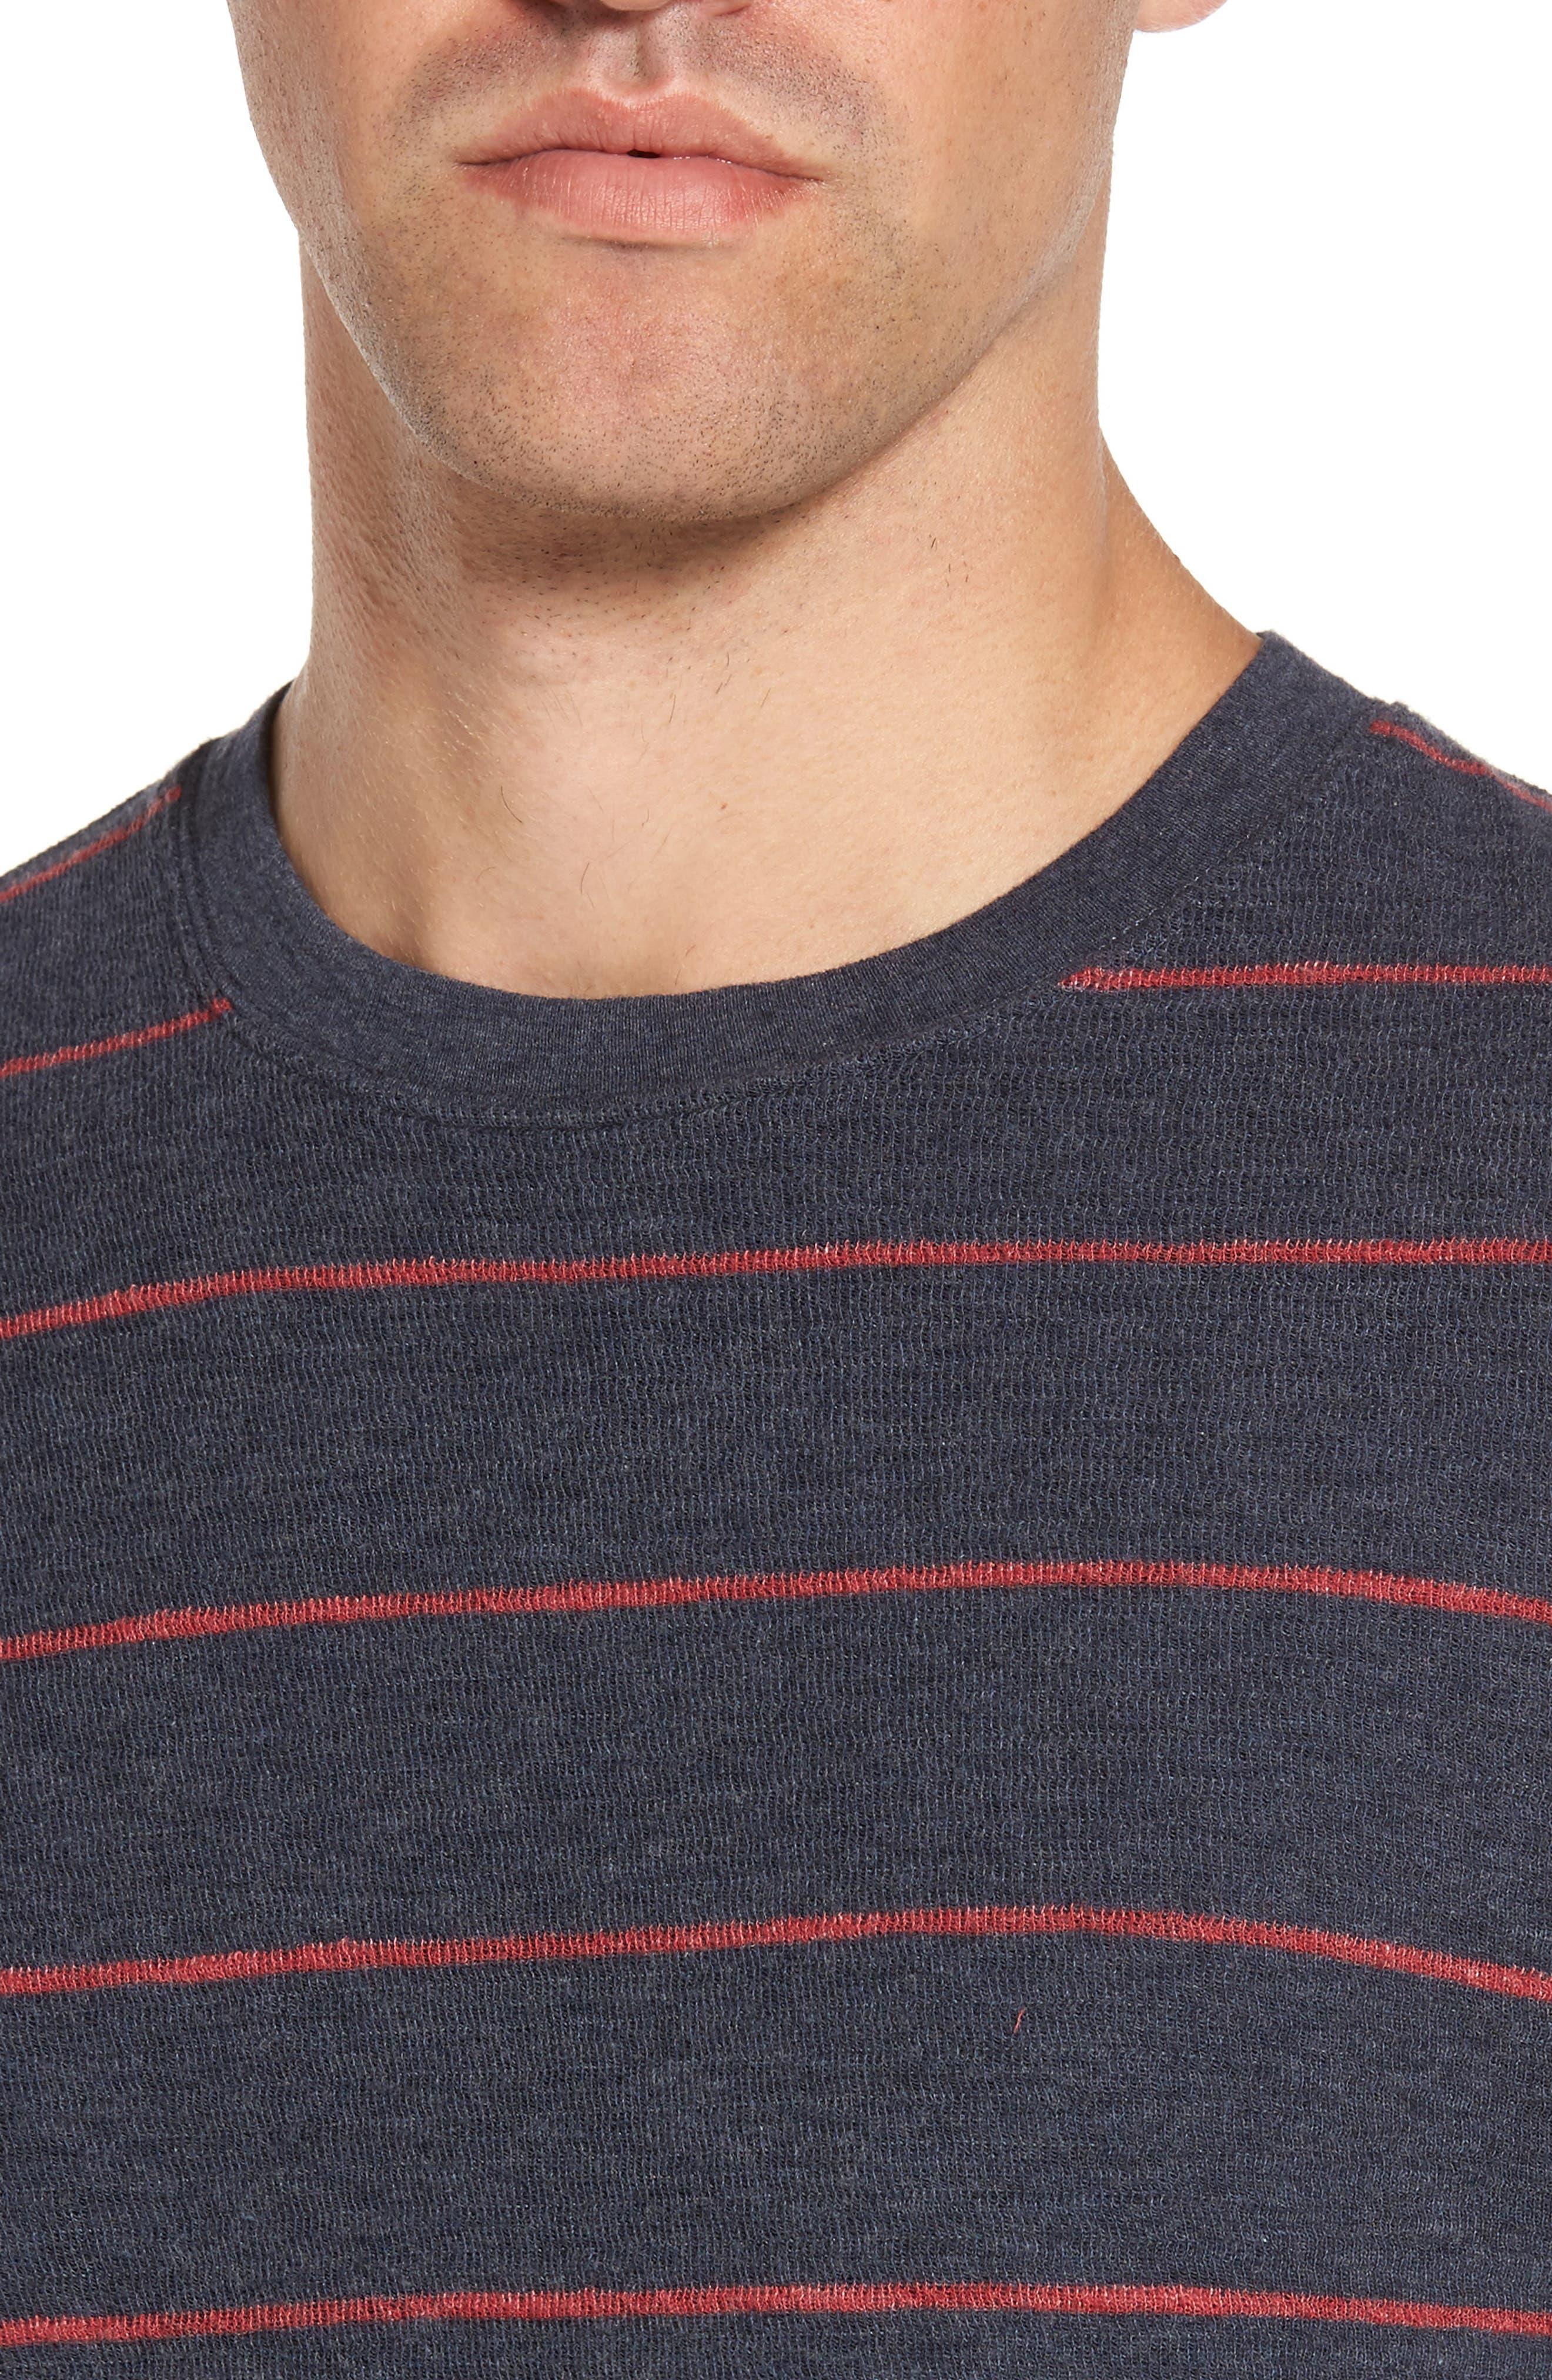 Baird Stripe Crewneck Sweatshirt,                             Alternate thumbnail 4, color,                             412